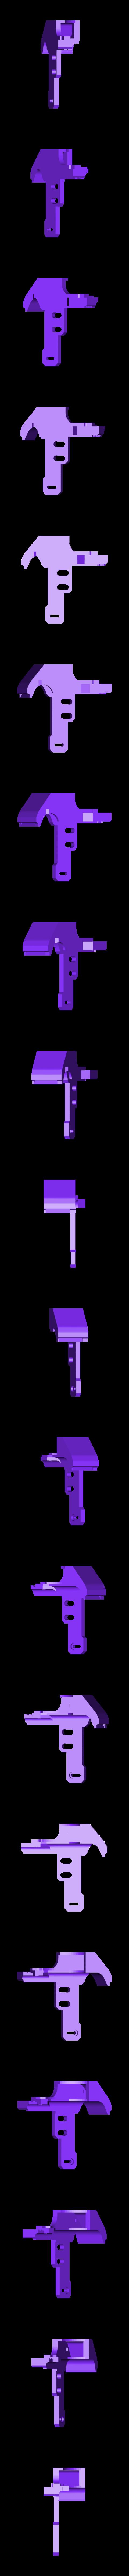 blowerright.stl Download free STL file CR10 direct heavy duty mod, titan + v5heatsink+volcano/ or / v6heatsink + pancake motor BETA • 3D print object, raffosan